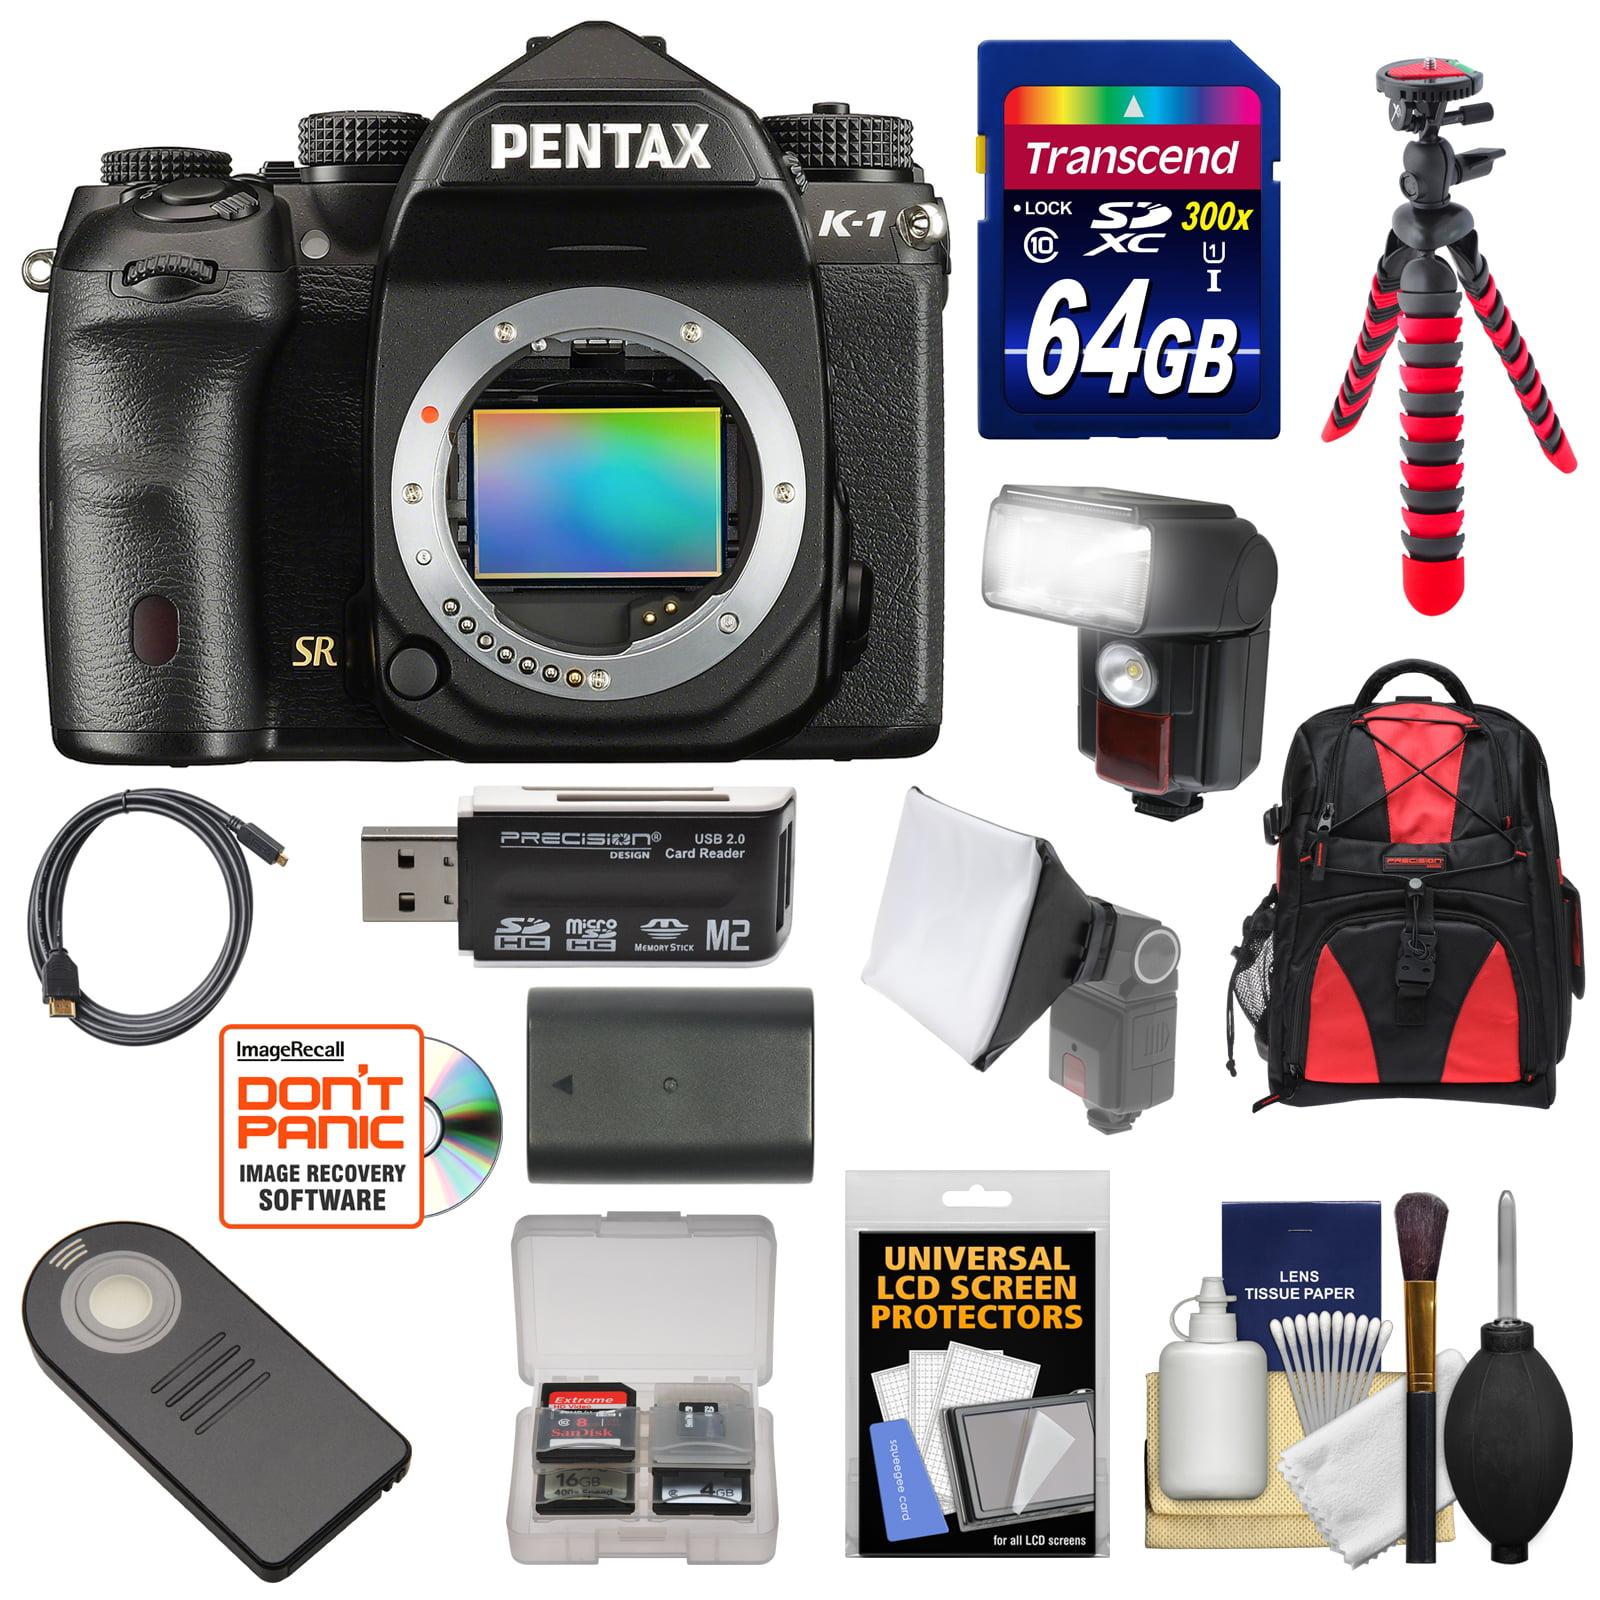 Pentax K-1 Mark II Full Frame Wi-Fi Digital SLR Camera Body with 64GB Card + Battery + Flash + Backpack +... by Pentax